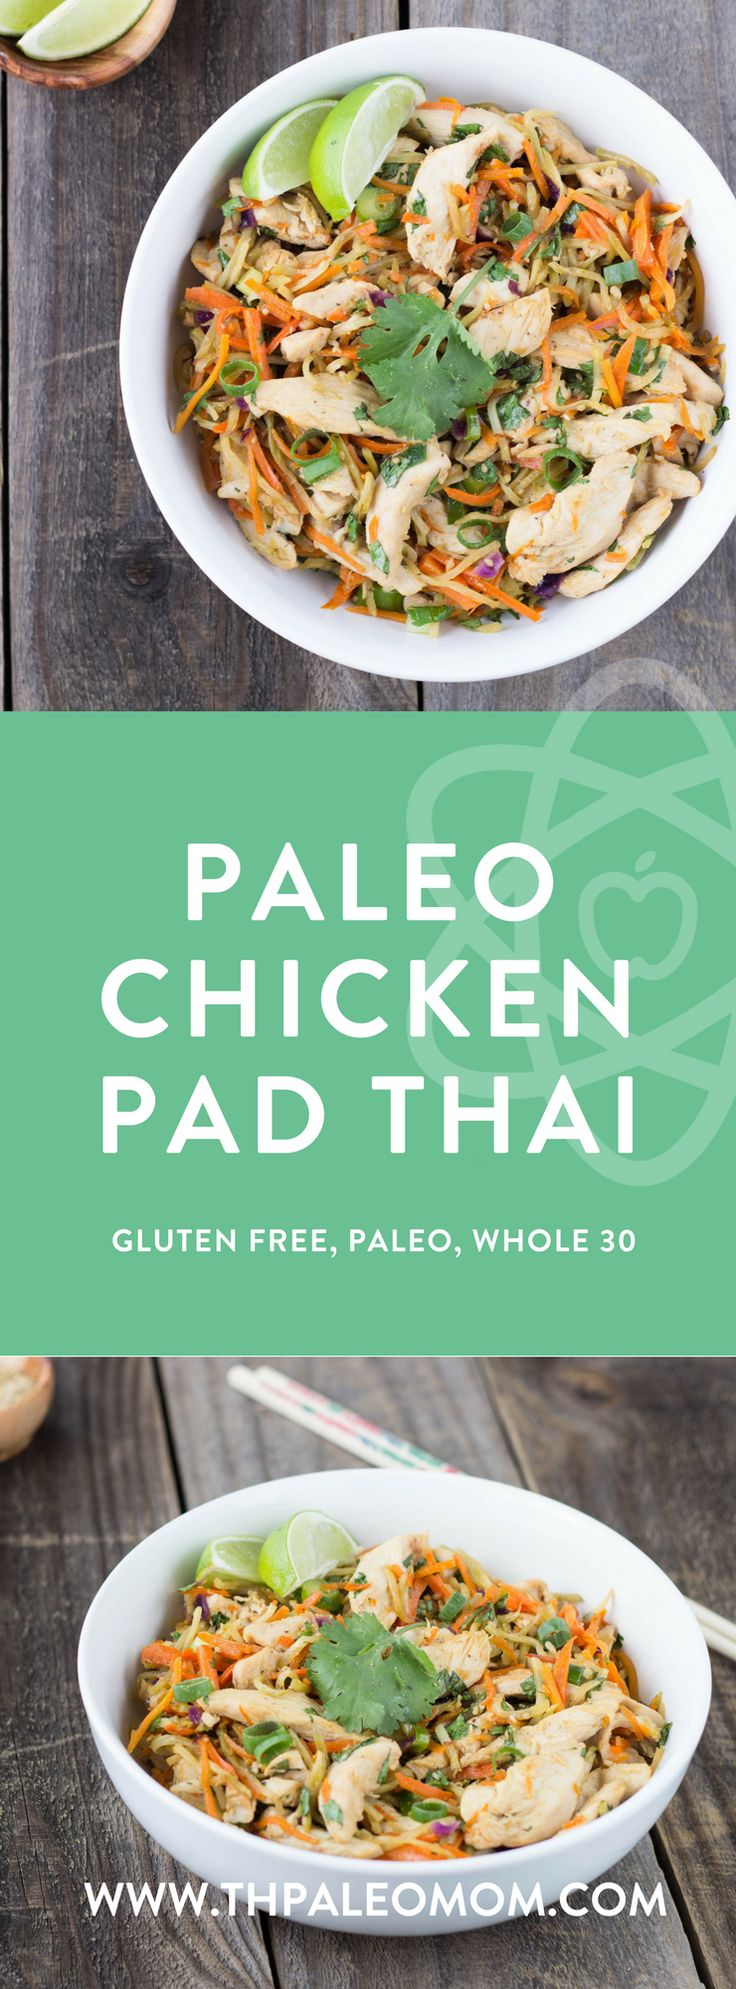 Paleo Pad Thai, Whole 30 Friendly | The Paleo Mom